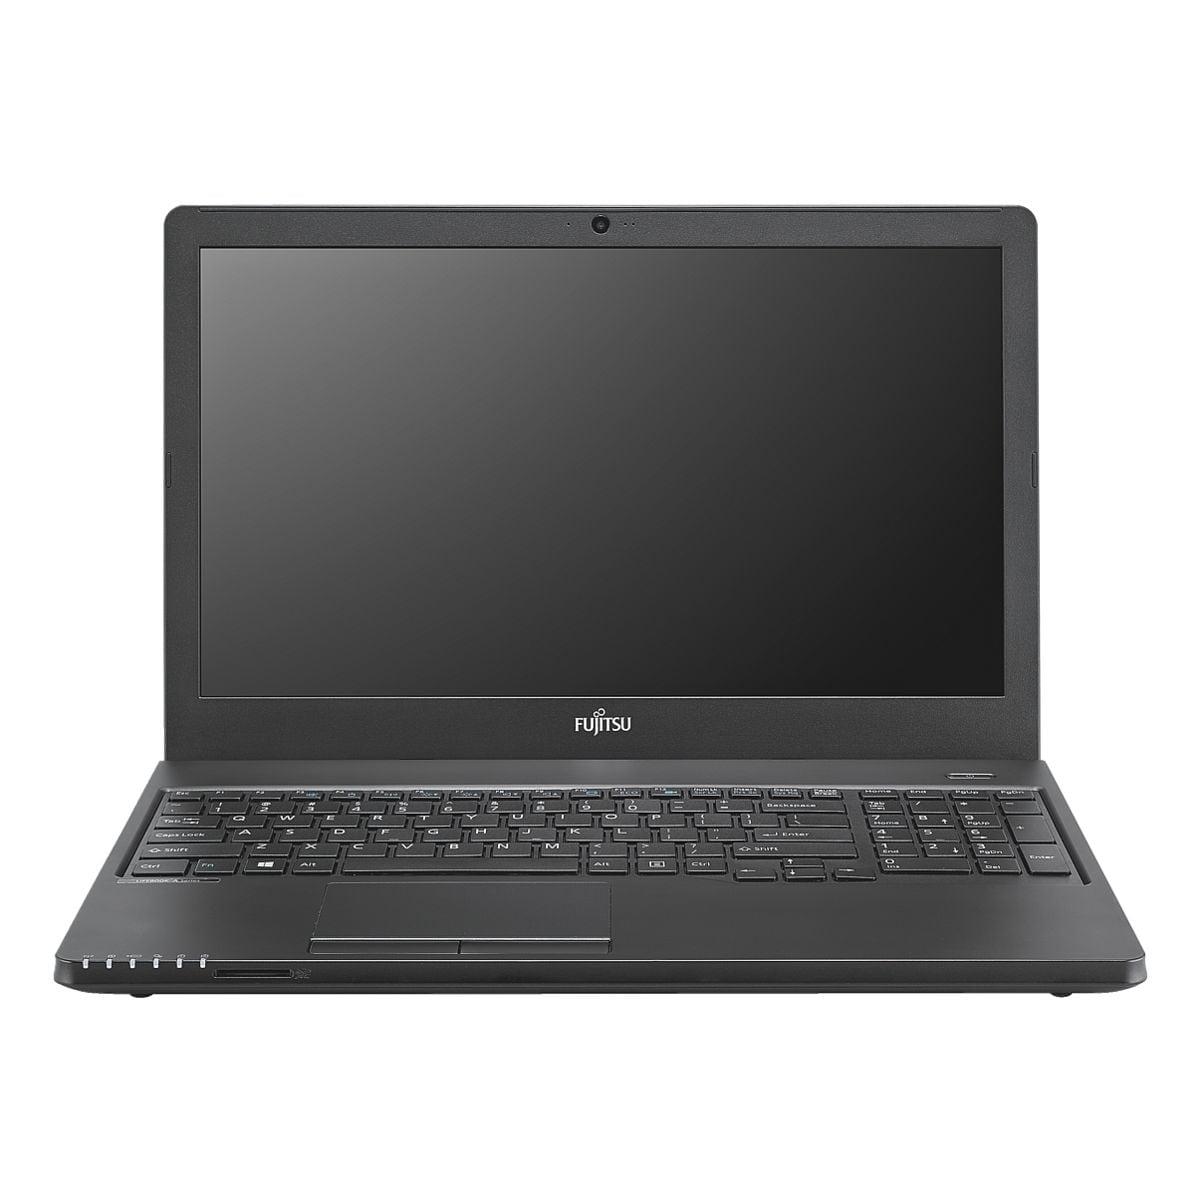 Fujitsu Notebook Lifebook A359 A3590MP580DE, Display 39,6 cm (15,6''), Intel® Core™ i5-8250U, 8 GB RAM, 256 GB SSD, Windows 10 Pro